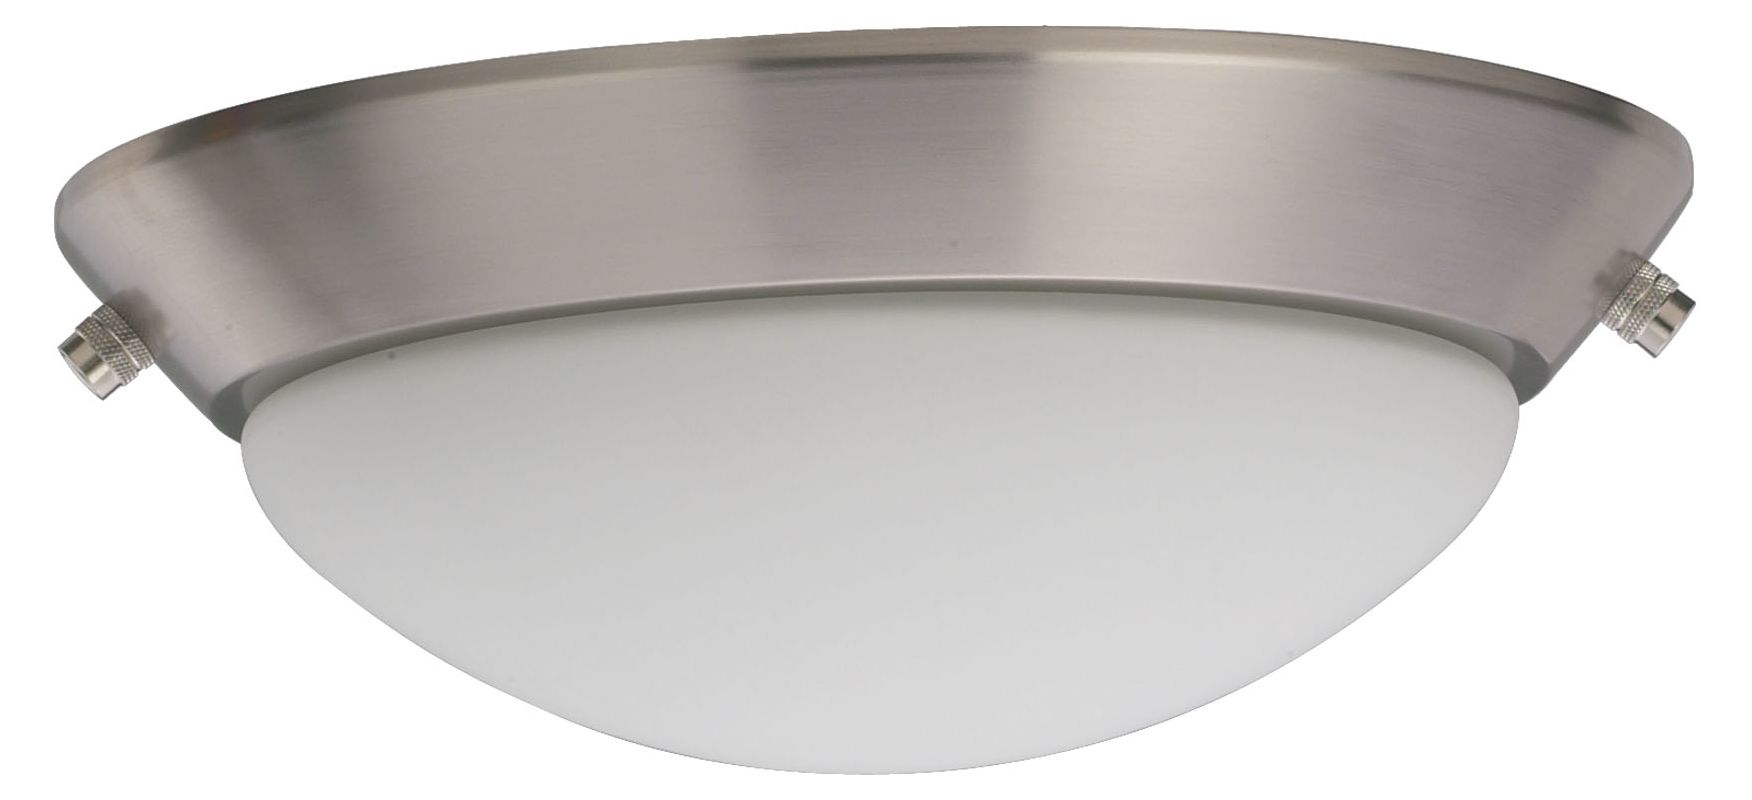 Quorum International 1504 2 Light Low Profile Ceiling Fan Bowl Light